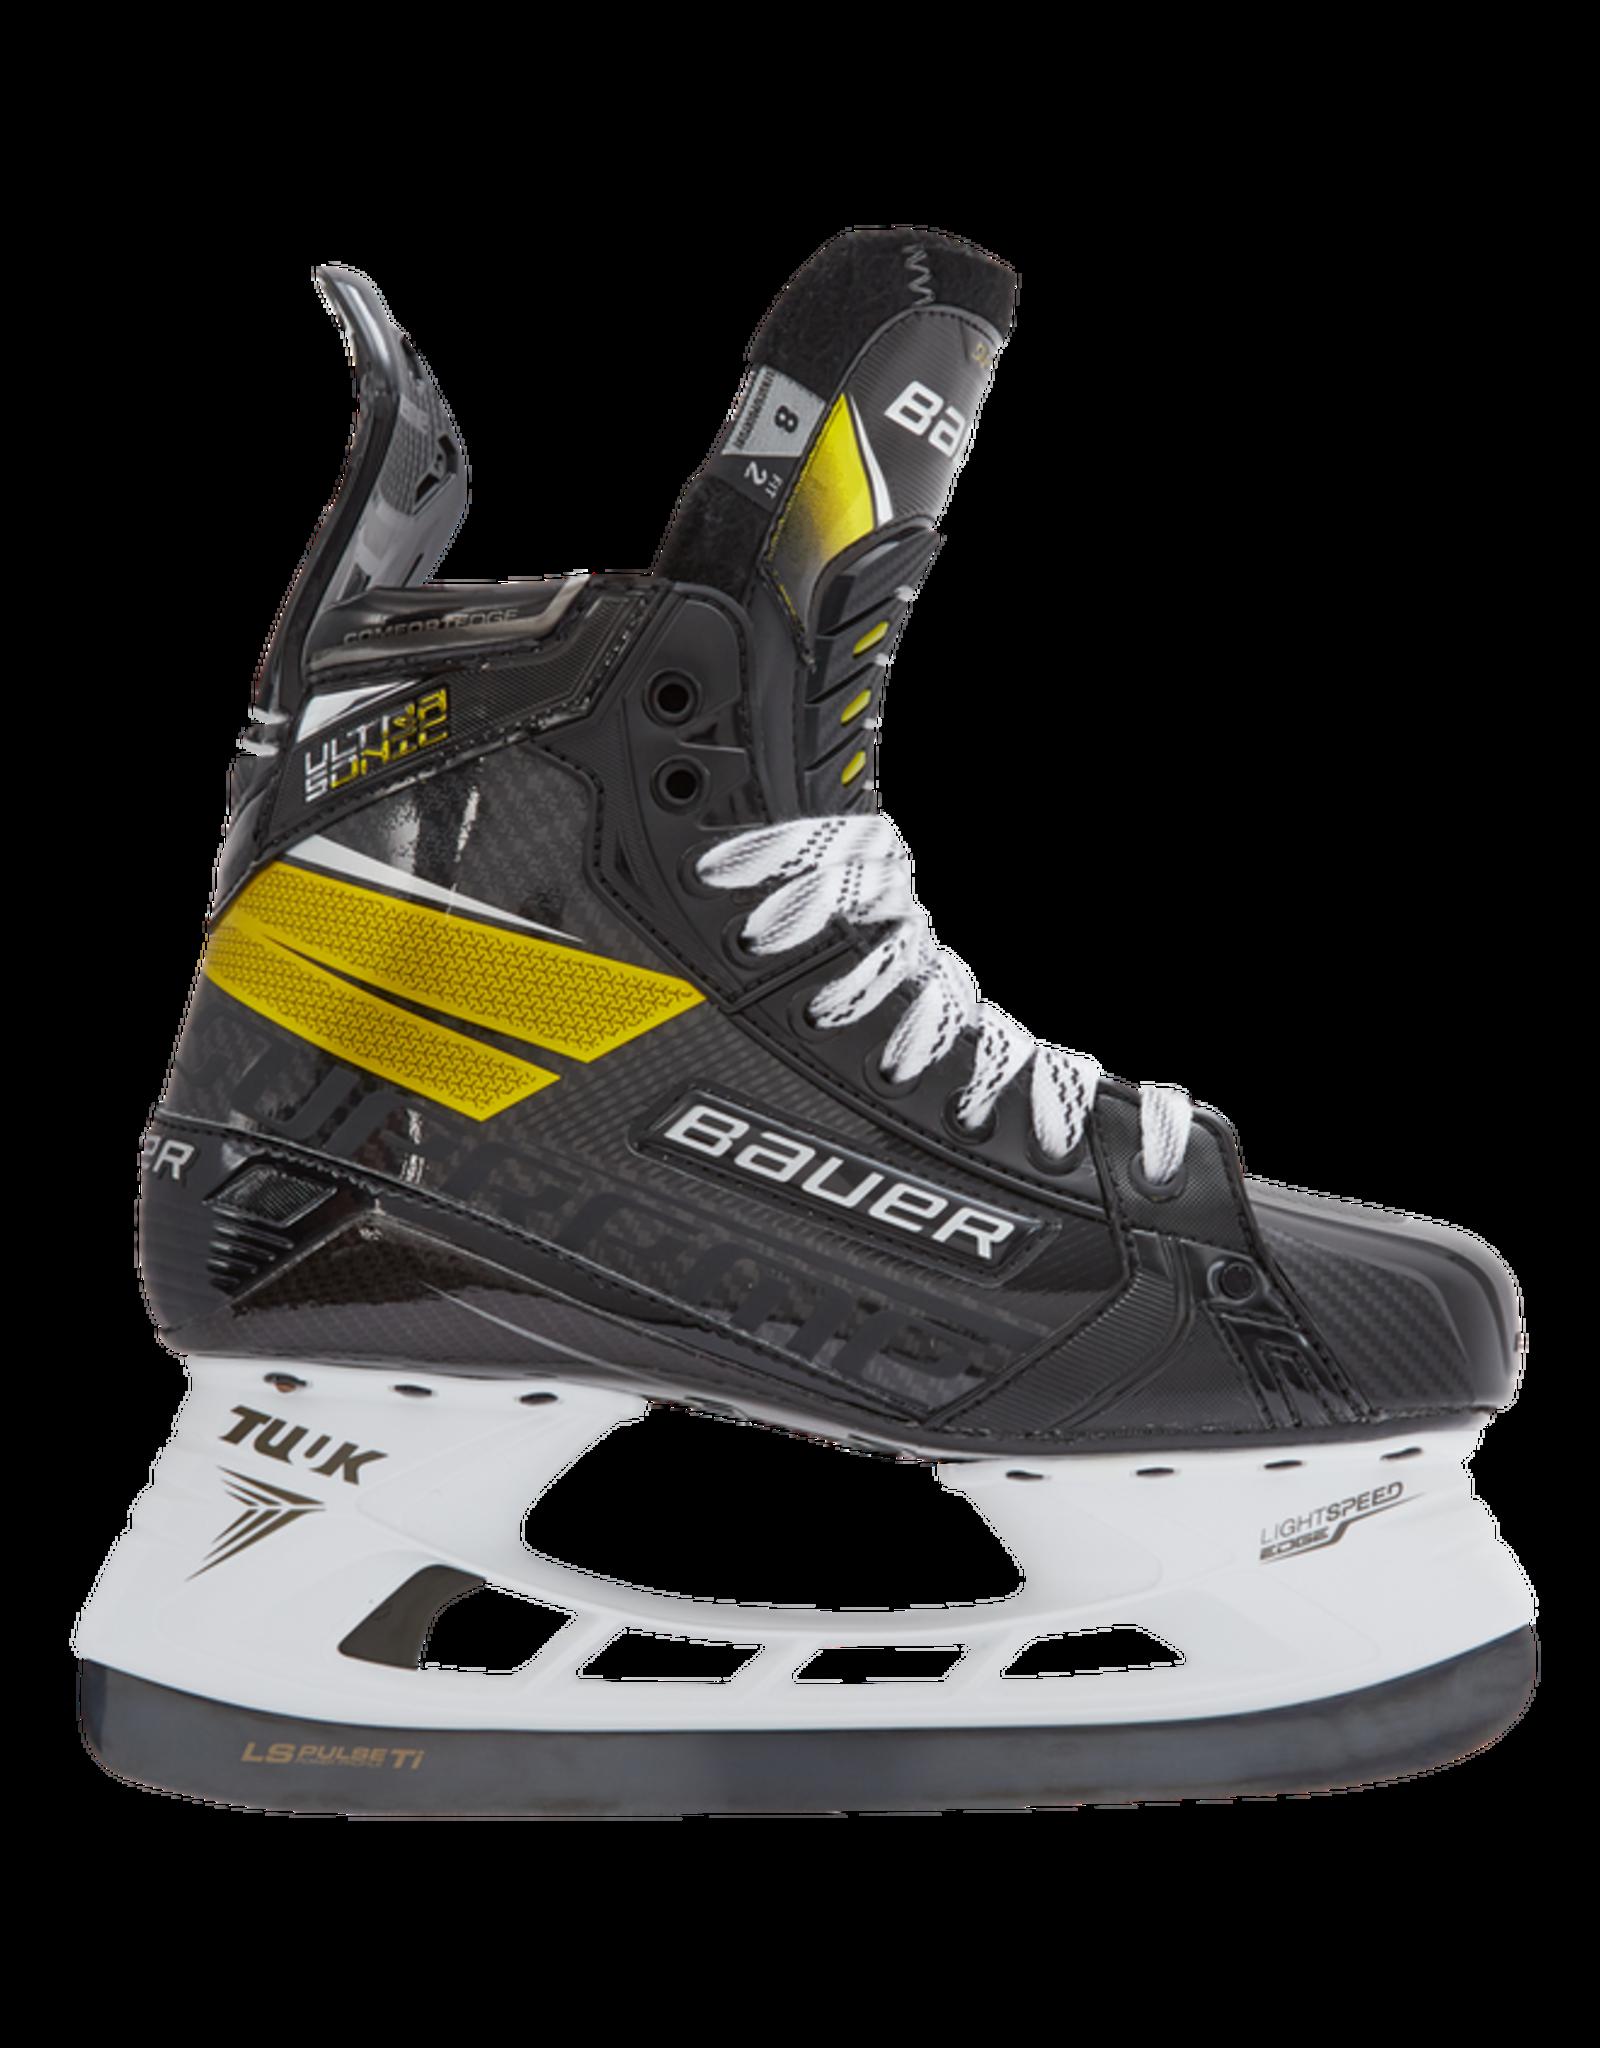 Bauer Hockey - Canada BAUER BTH20 SUPREME ULTRA SONIC SKATE INT